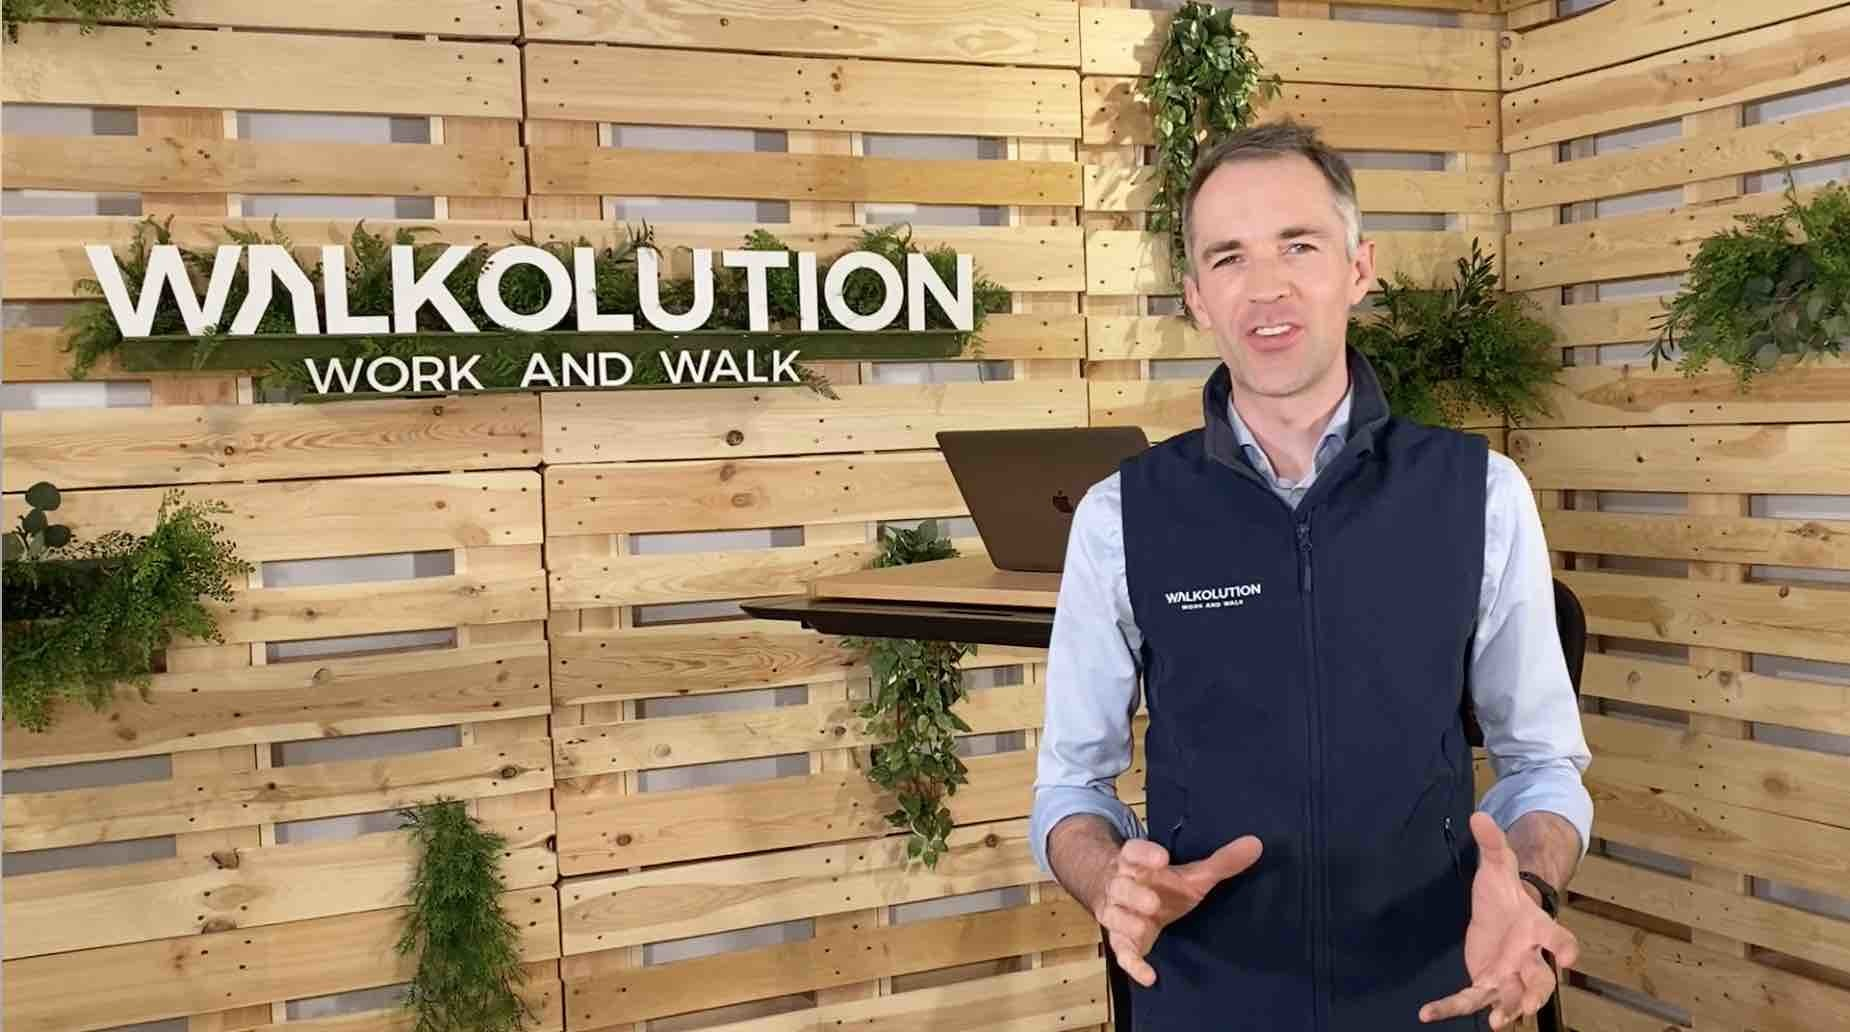 WALKOLUTION - Product Demonstration